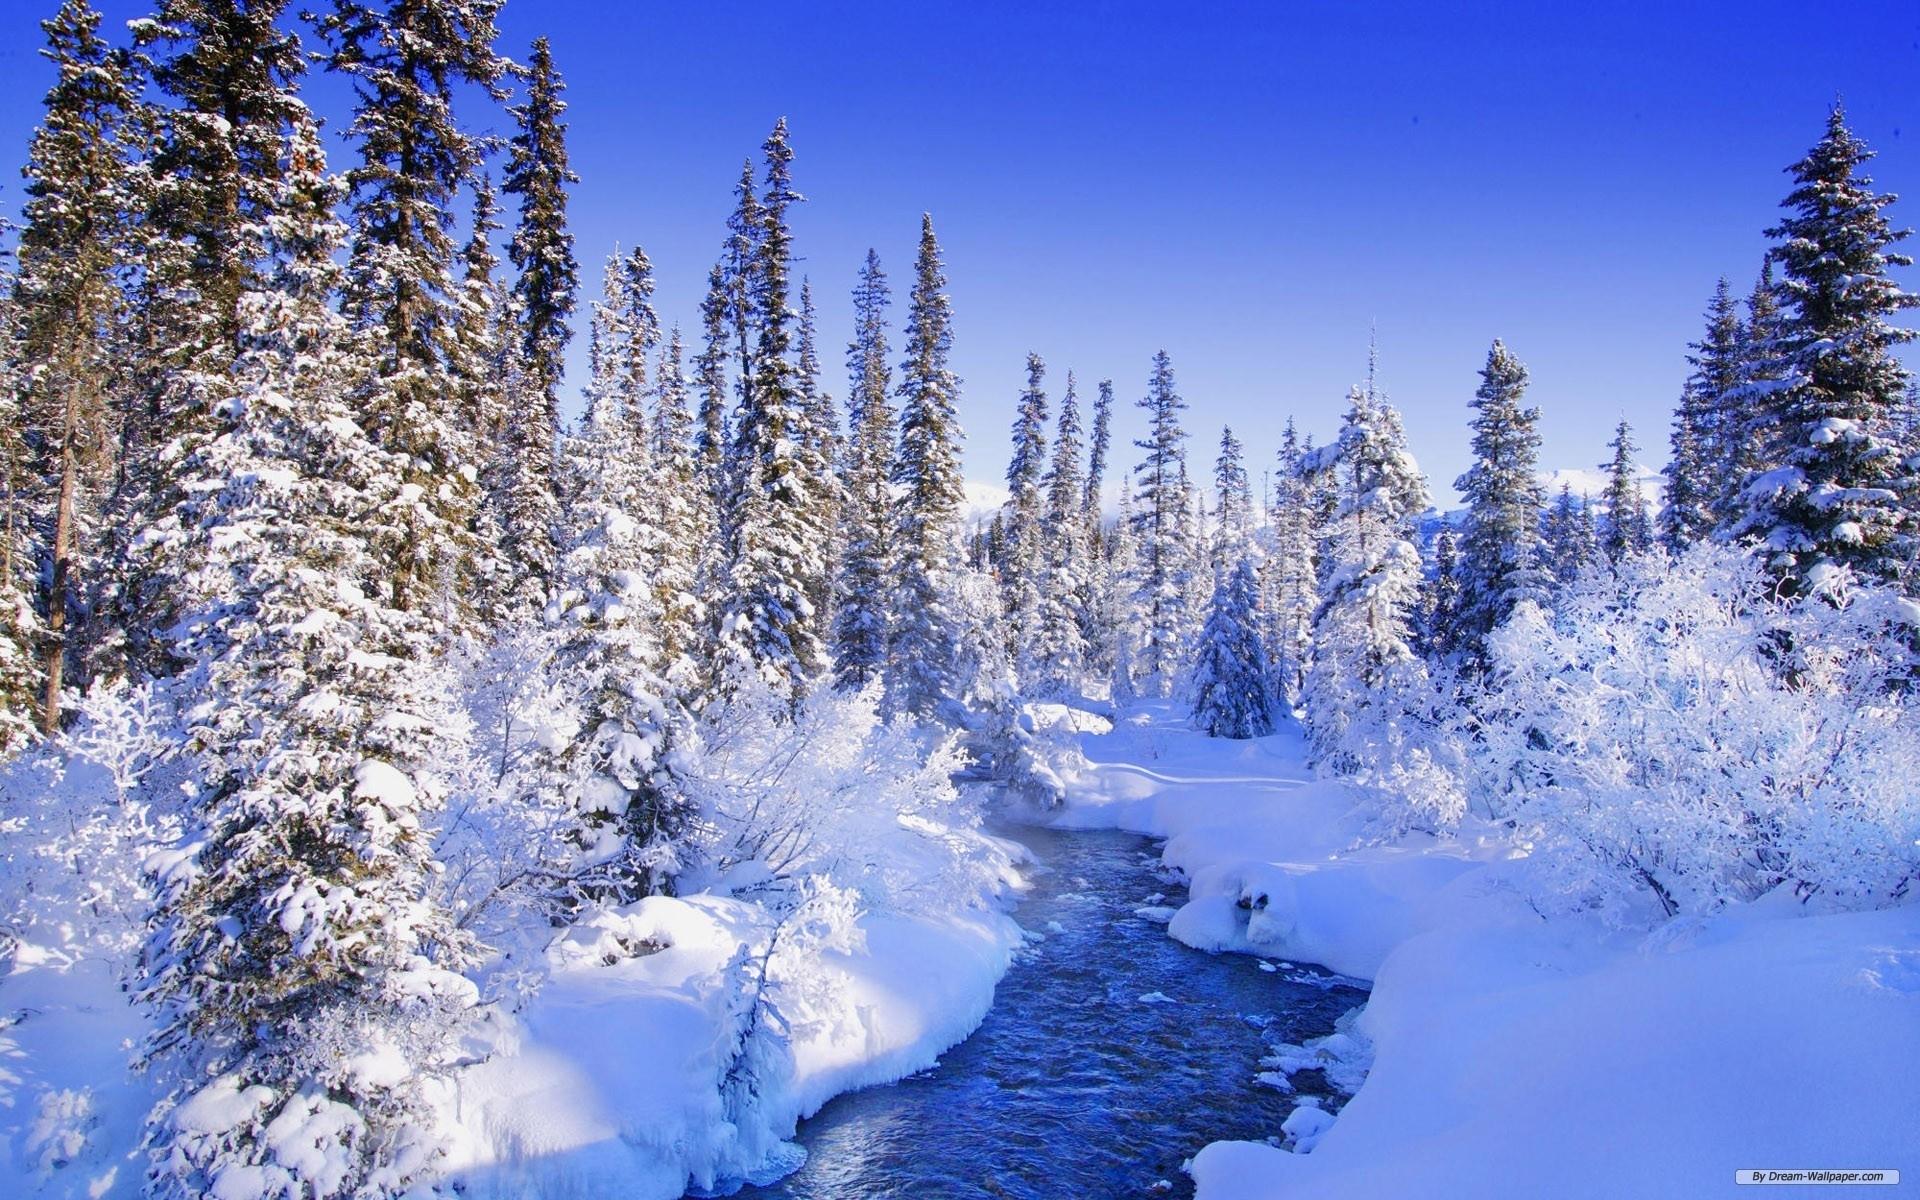 free wallpaper - free nature wallpaper - winter wonderland 10